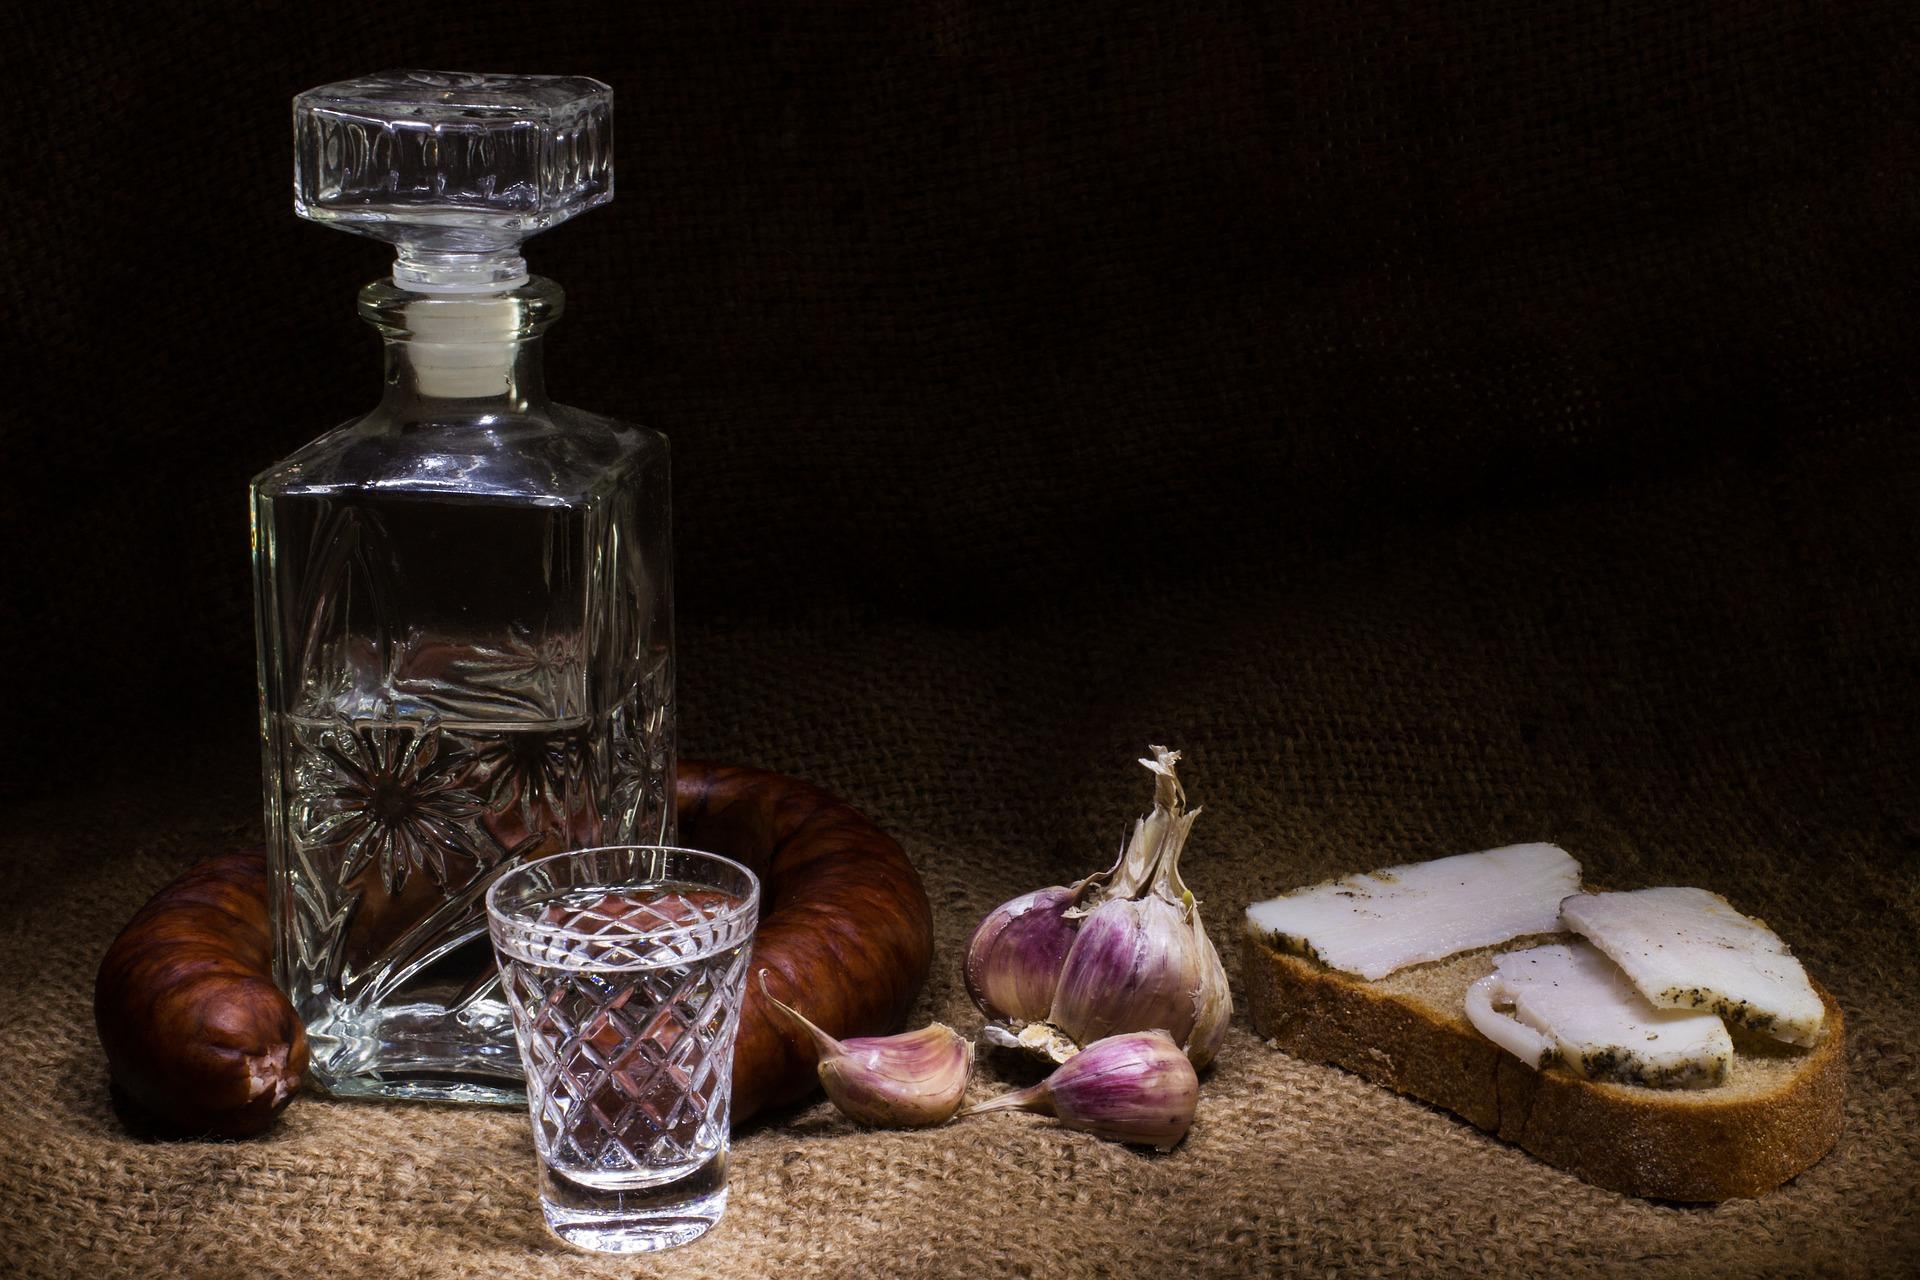 maak in 5 stappen je eigen vodka | Food Bird